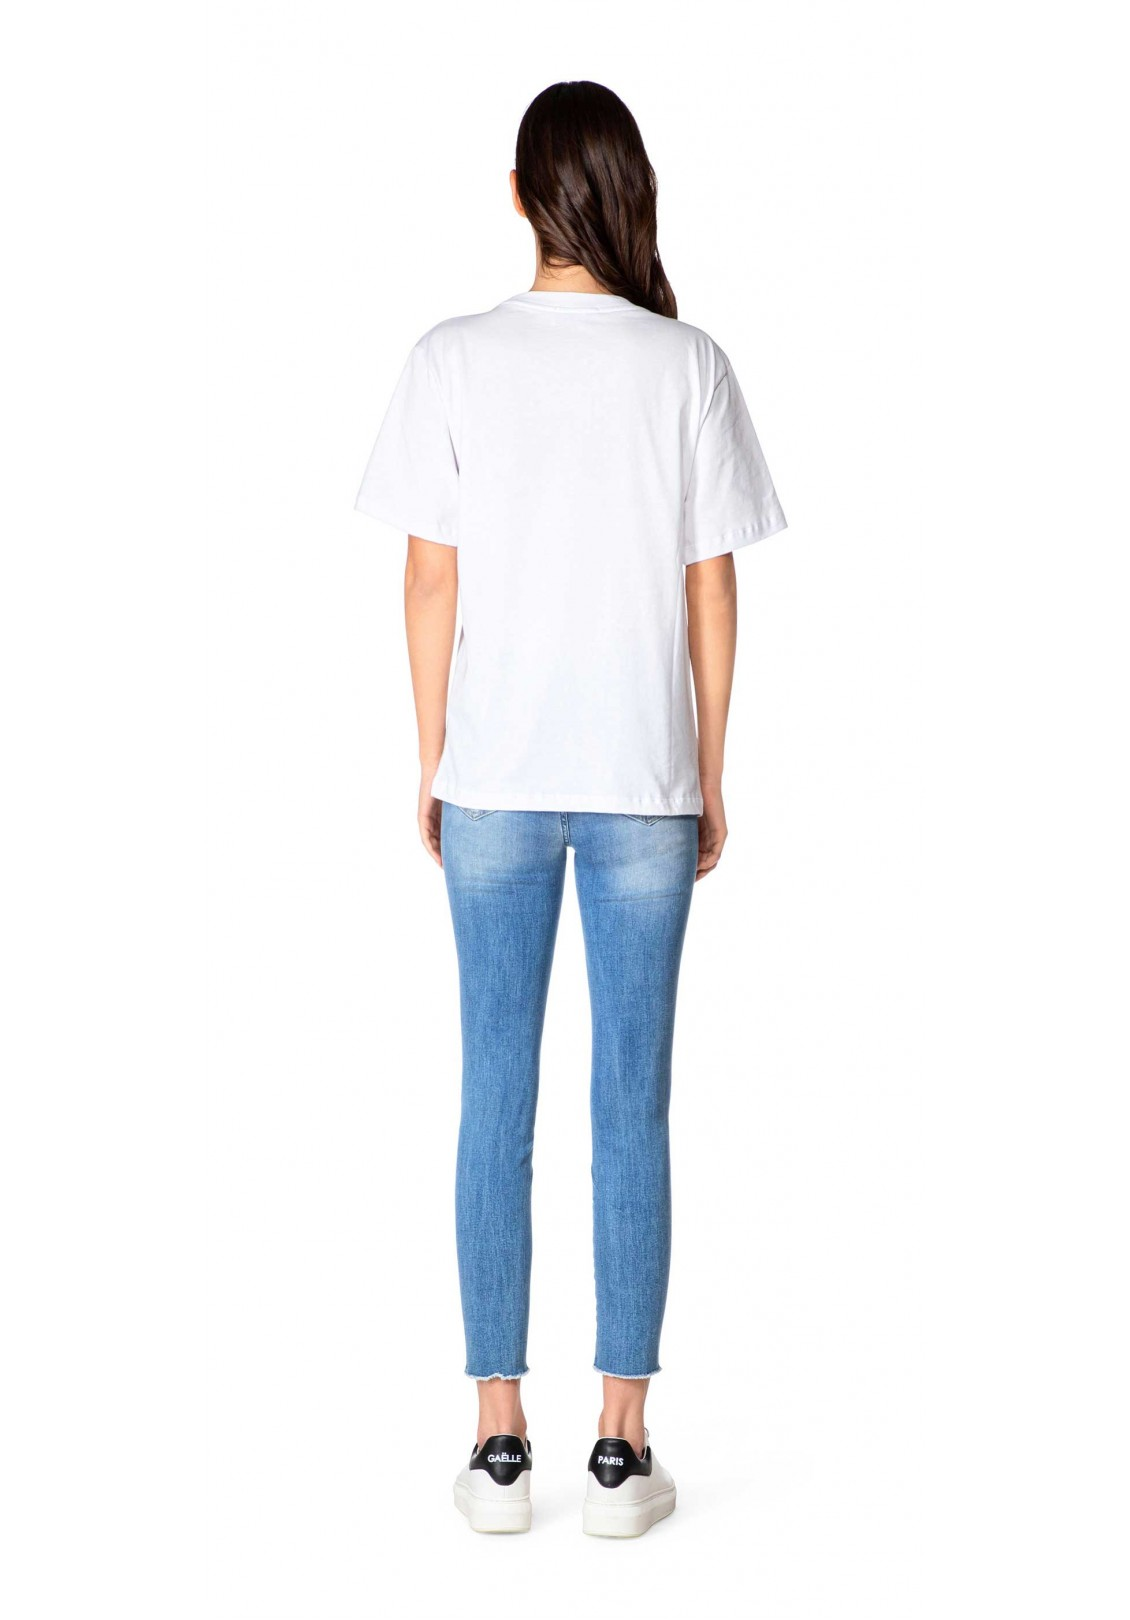 Gaelle T-shirt Donna Bianco Gaelle | GBD8762BIANCO